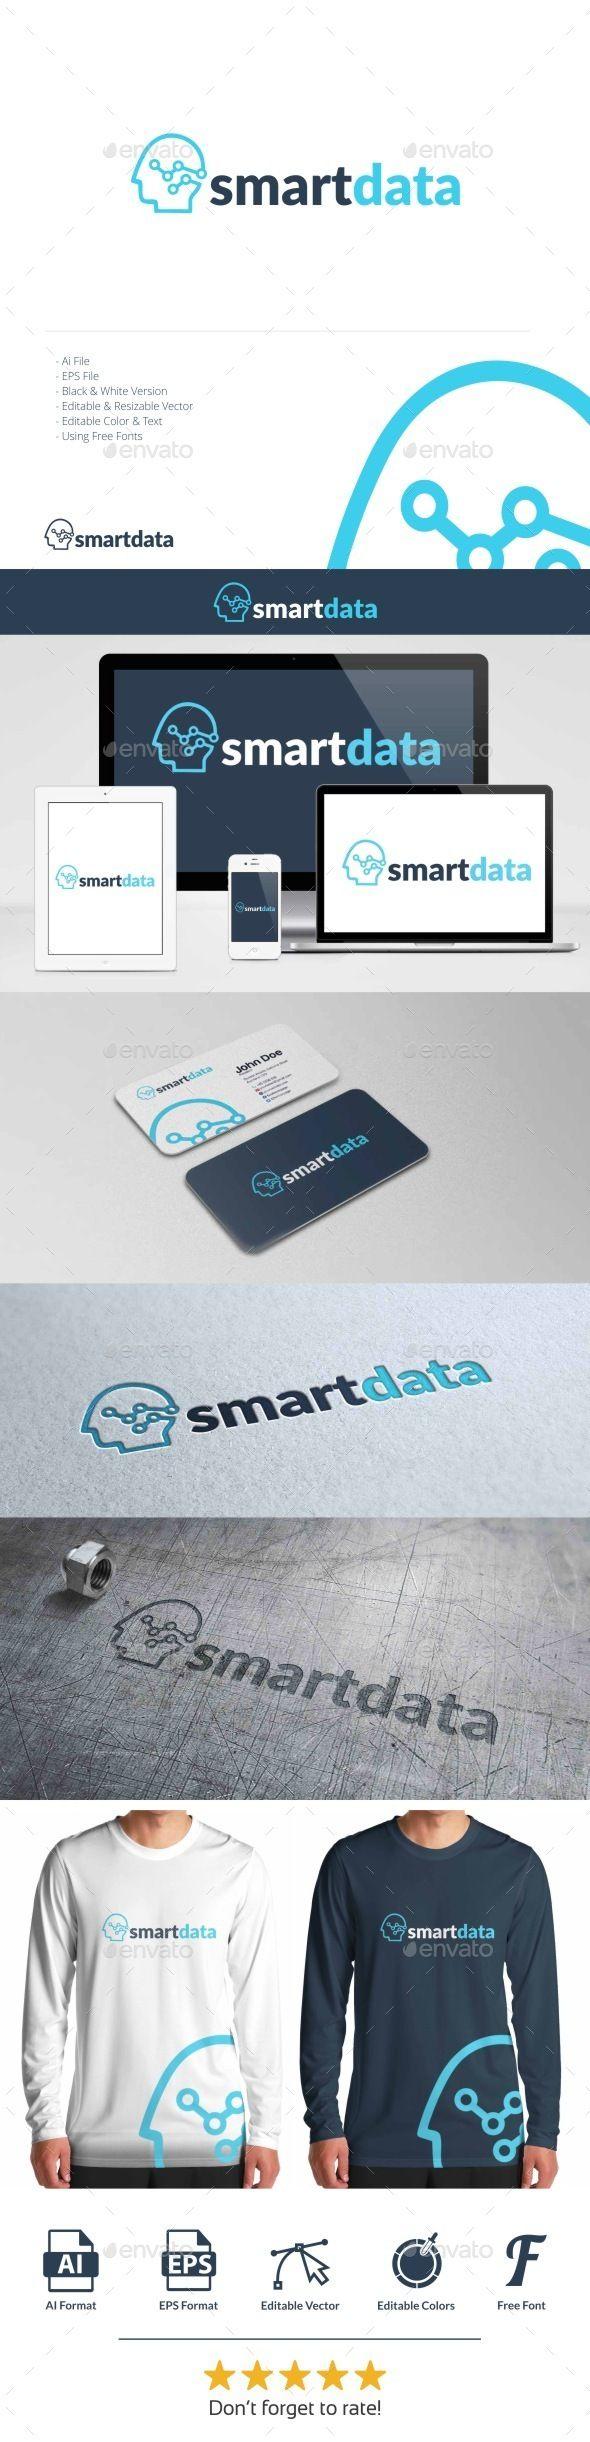 Smart Data - Logo Design Template Vector #logotype Download it here: http://graphicriver.net/item/smart-data-logo/10853534?s_rank=388?ref=nexion